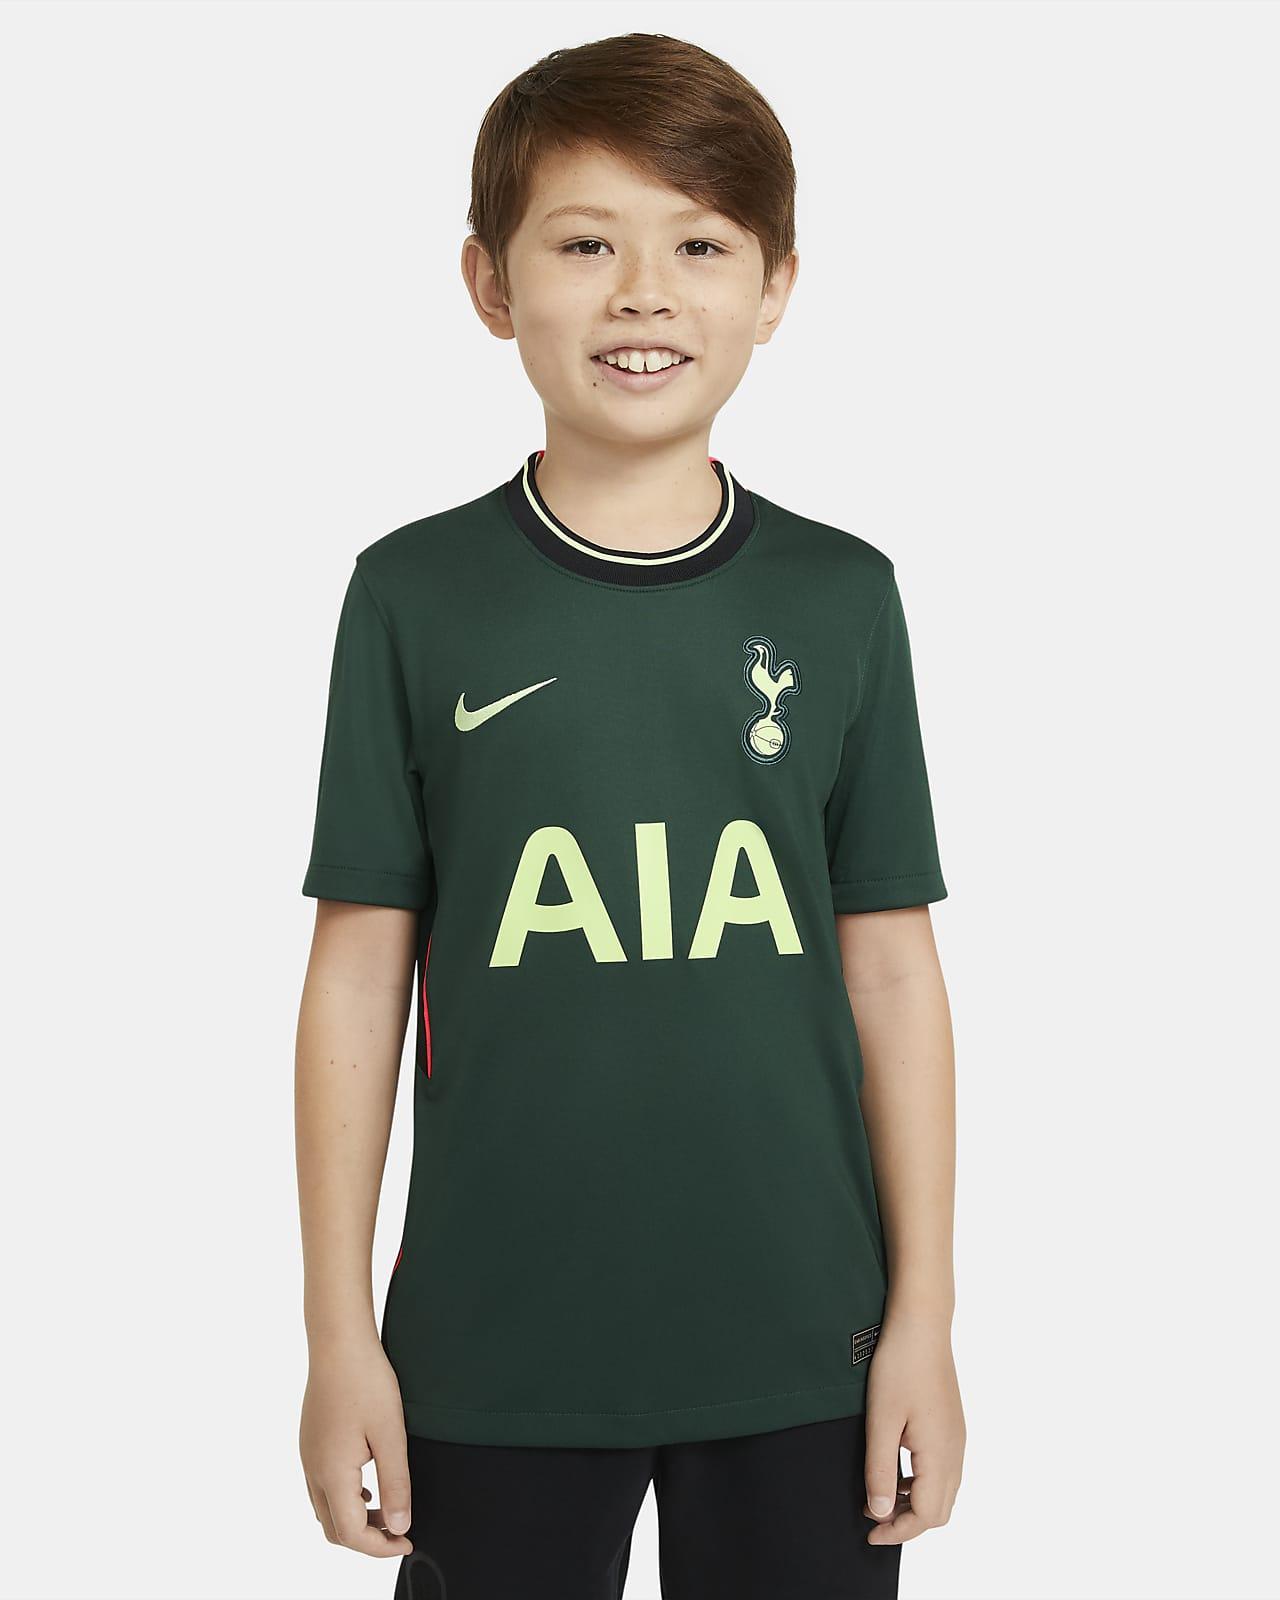 Tottenham Hotspur 2020/21 Stadium Away Older Kids' Football Shirt